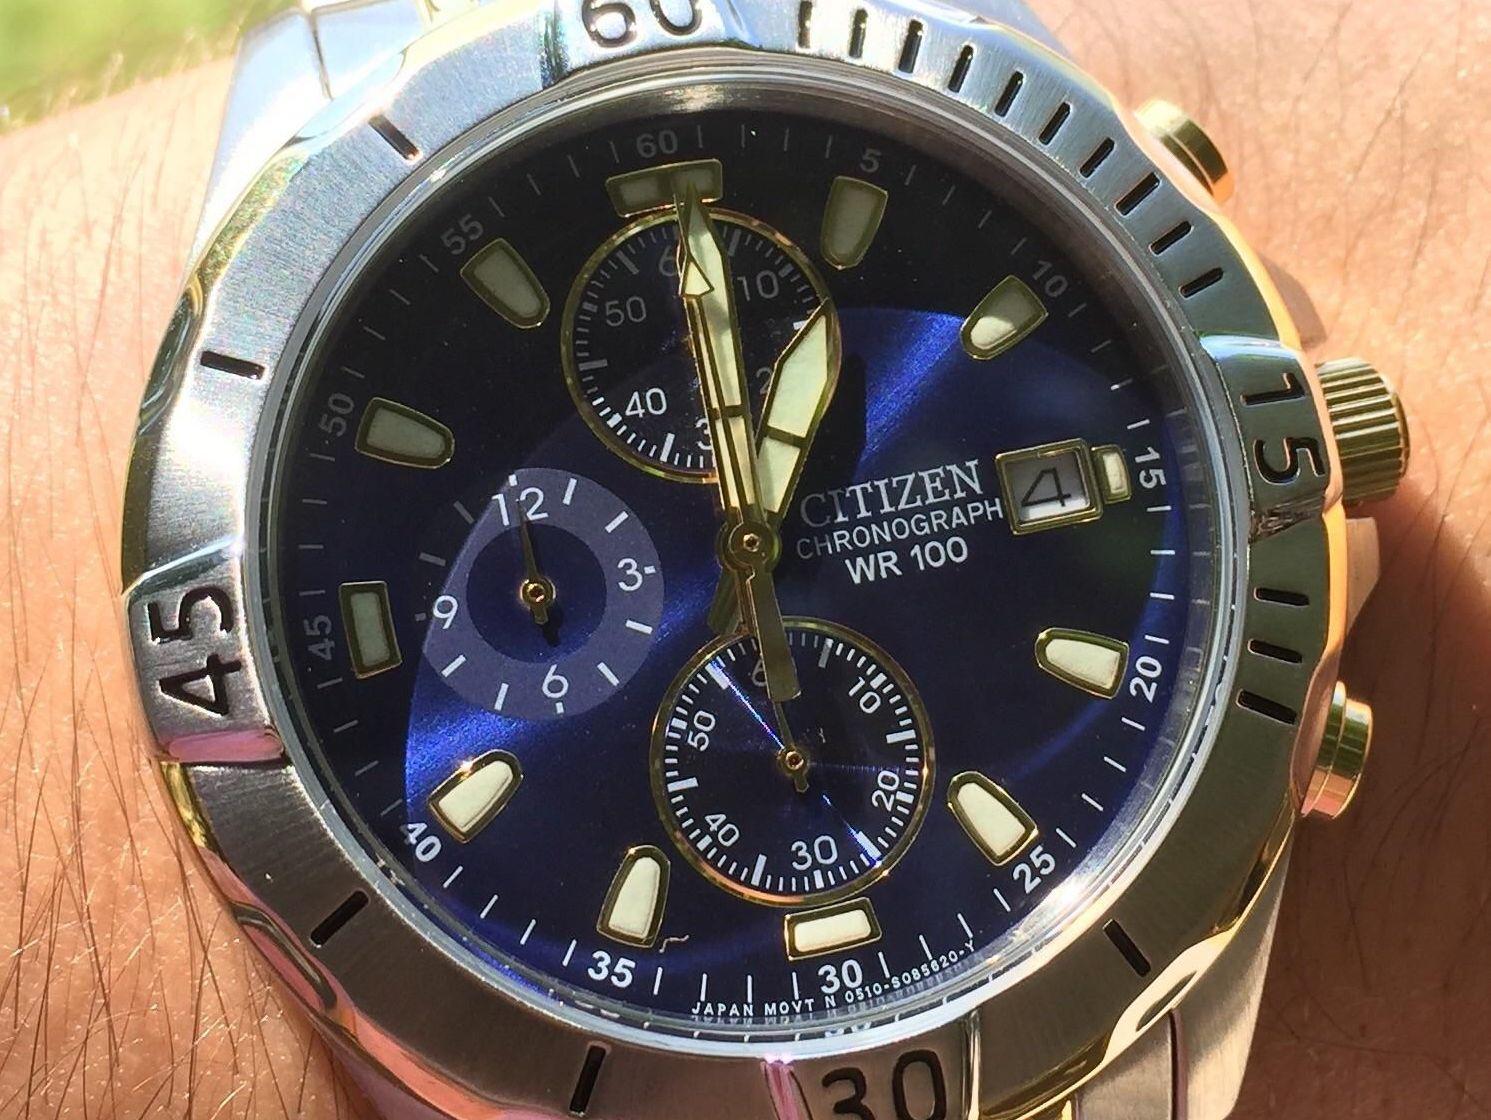 Citizen AN3394-59L Two-Tone Chronograph Watch Review